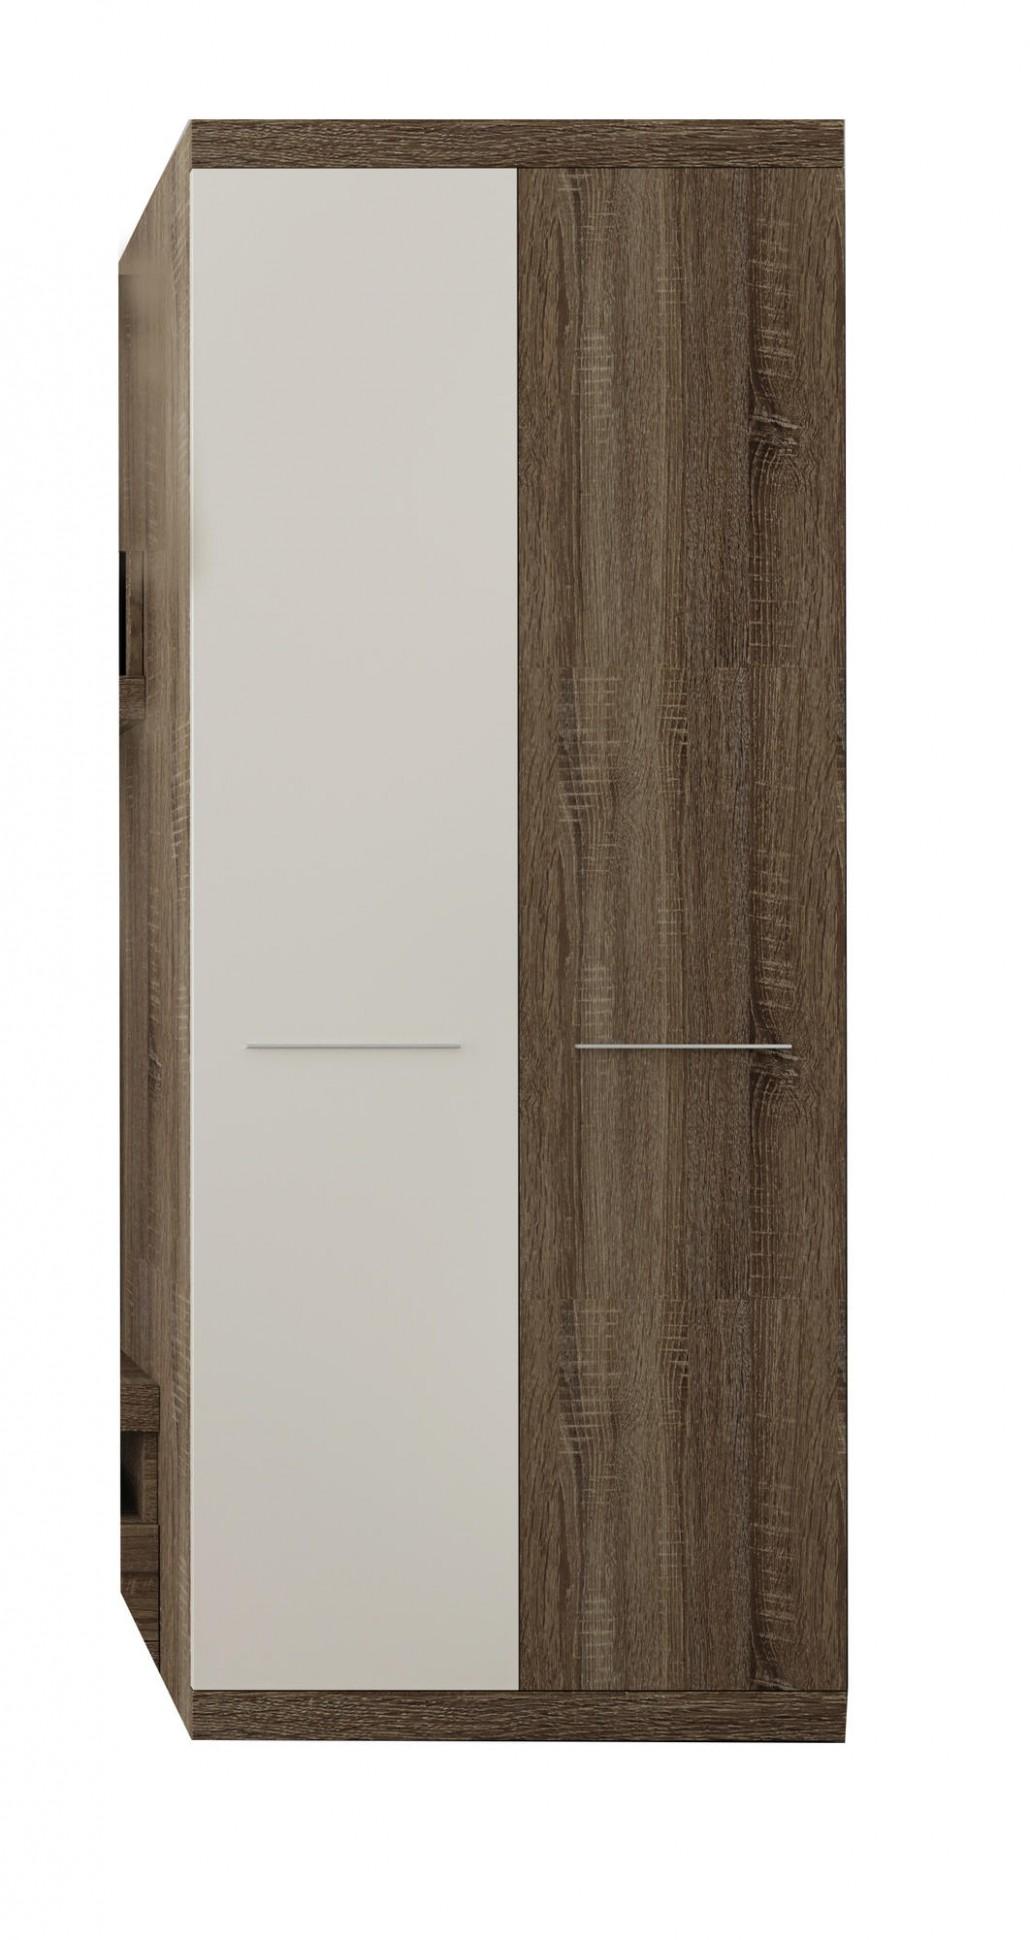 Skříň TORINO TK44 SCONTO nábytek – Levné postele, matrace a rošty